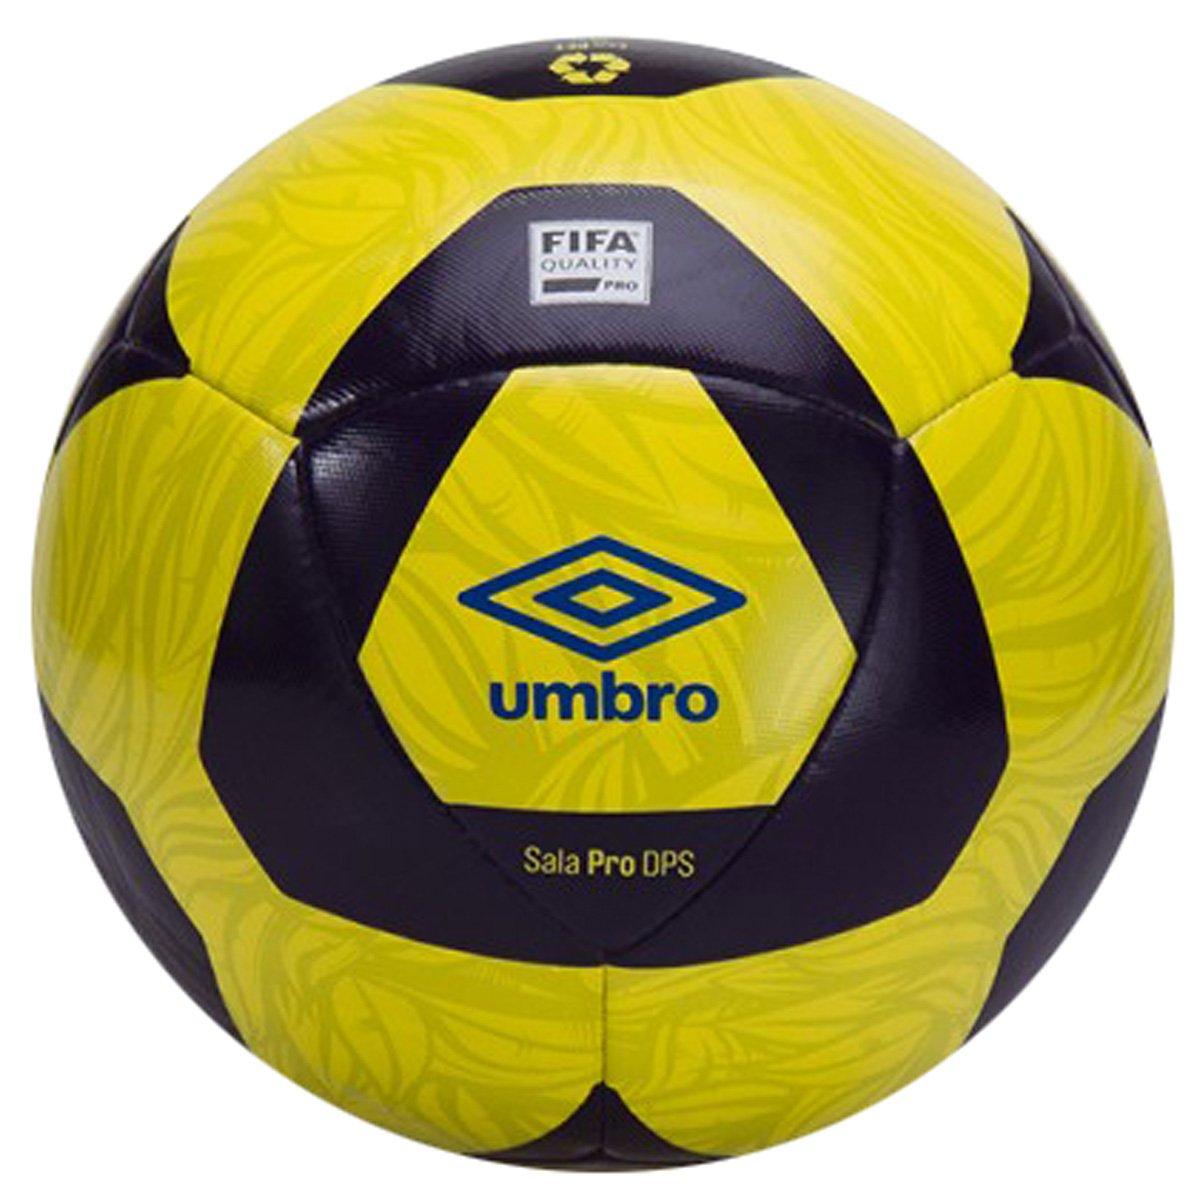 89f0035a0b374 Bola Futsal Umbro Sala Pro 1P78020 037 - Amarelo Marinho - Botas ...